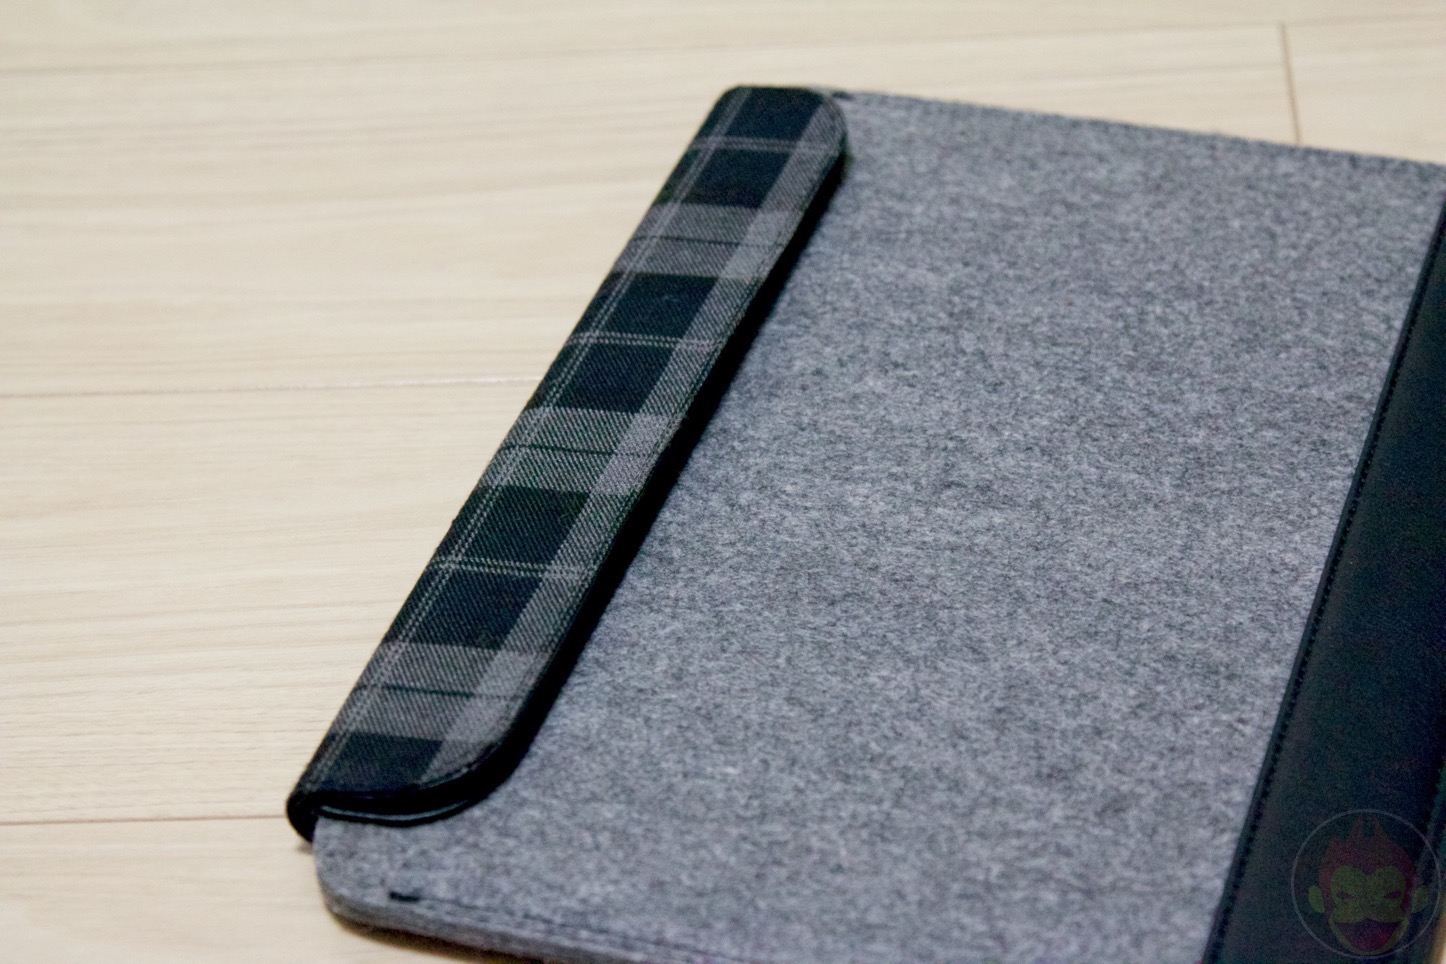 Inateck-12inch-MacBook-Case-003.jpg